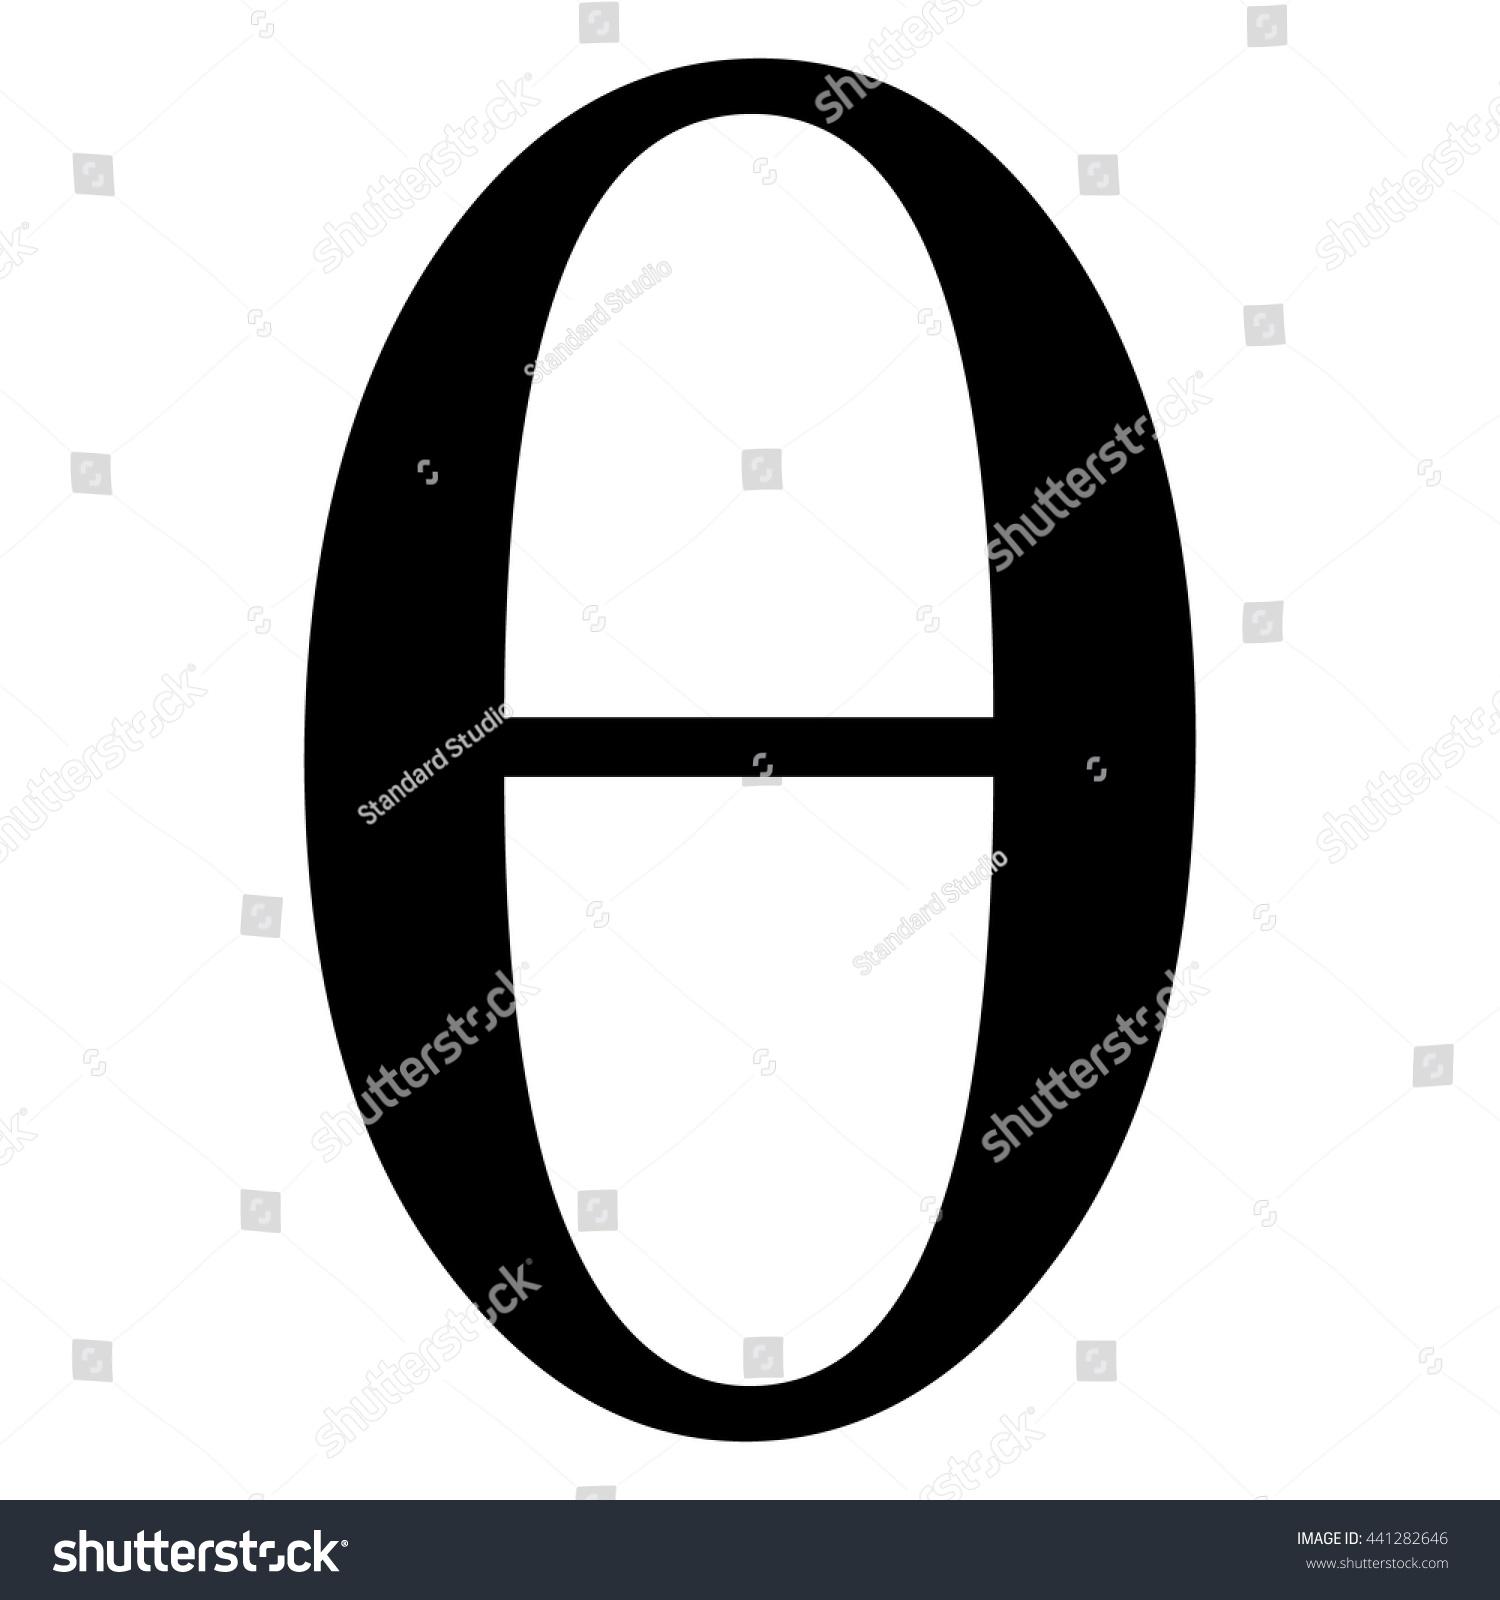 Theta greek letter theta symbol vector stock vector 441282646 theta greek letter theta symbol vector illustration biocorpaavc Image collections